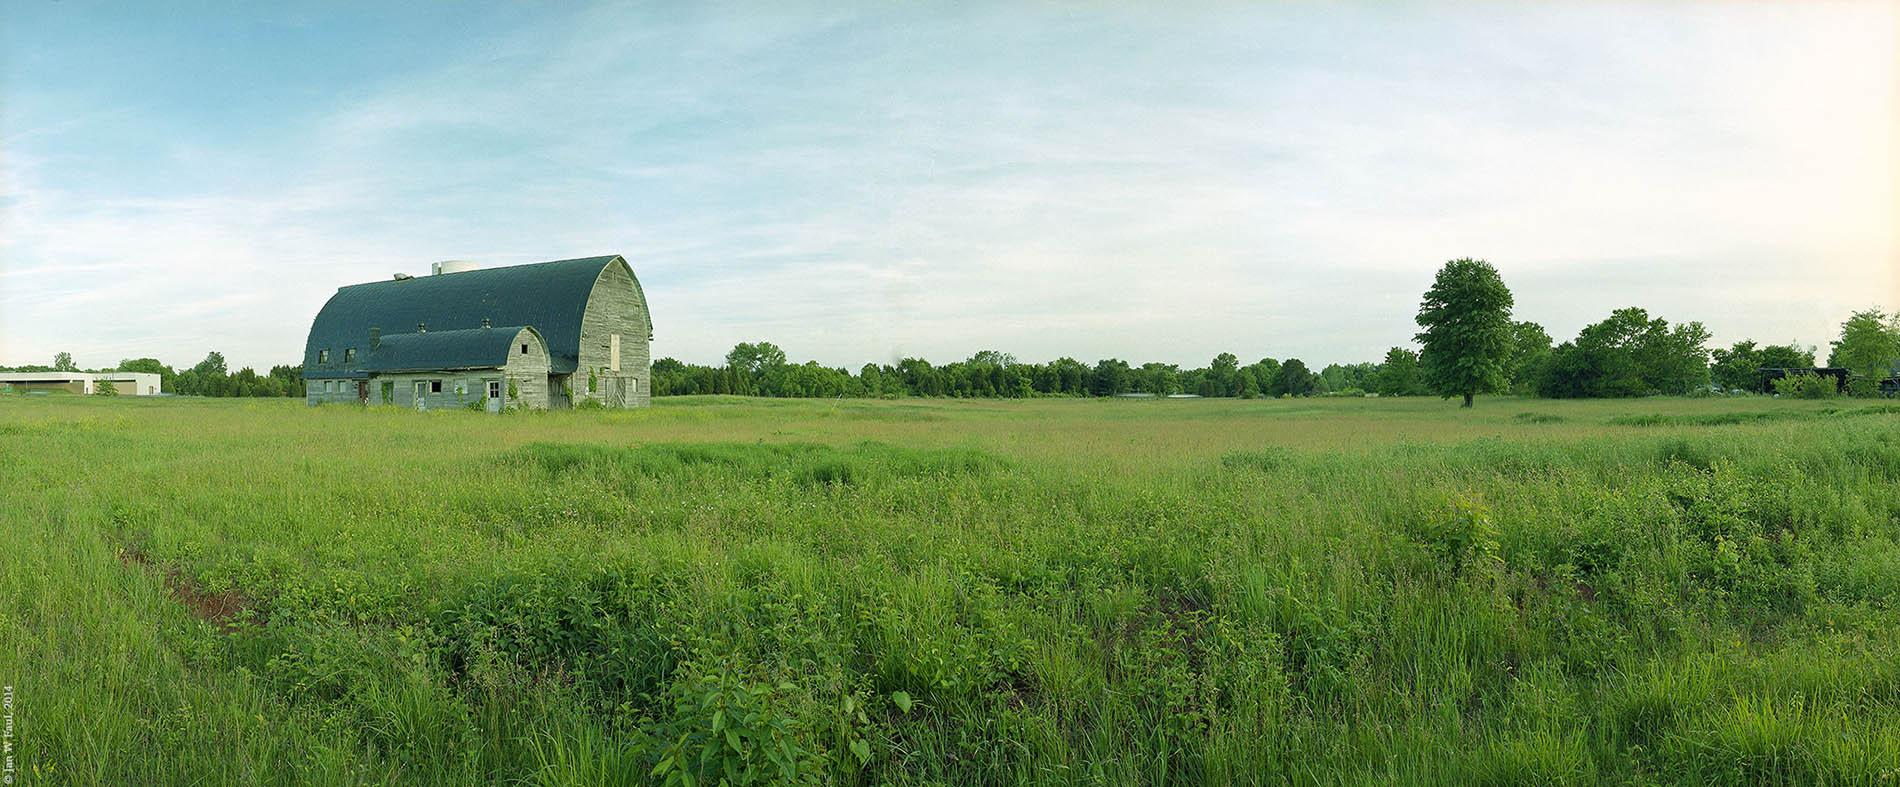 Remington, Gothic arch barn